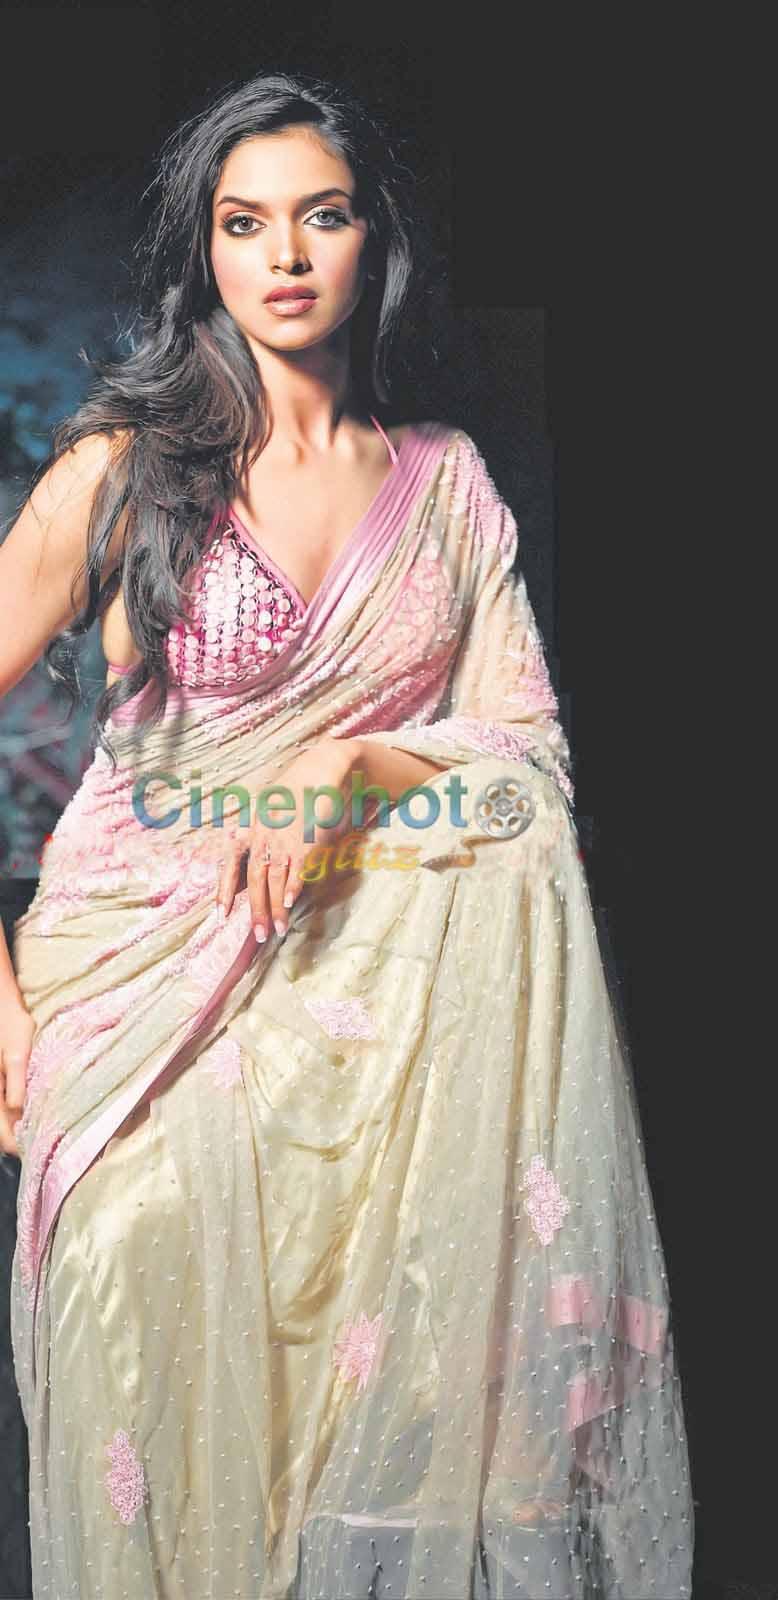 celebrity Gossip: deepika Padukone In White Saree